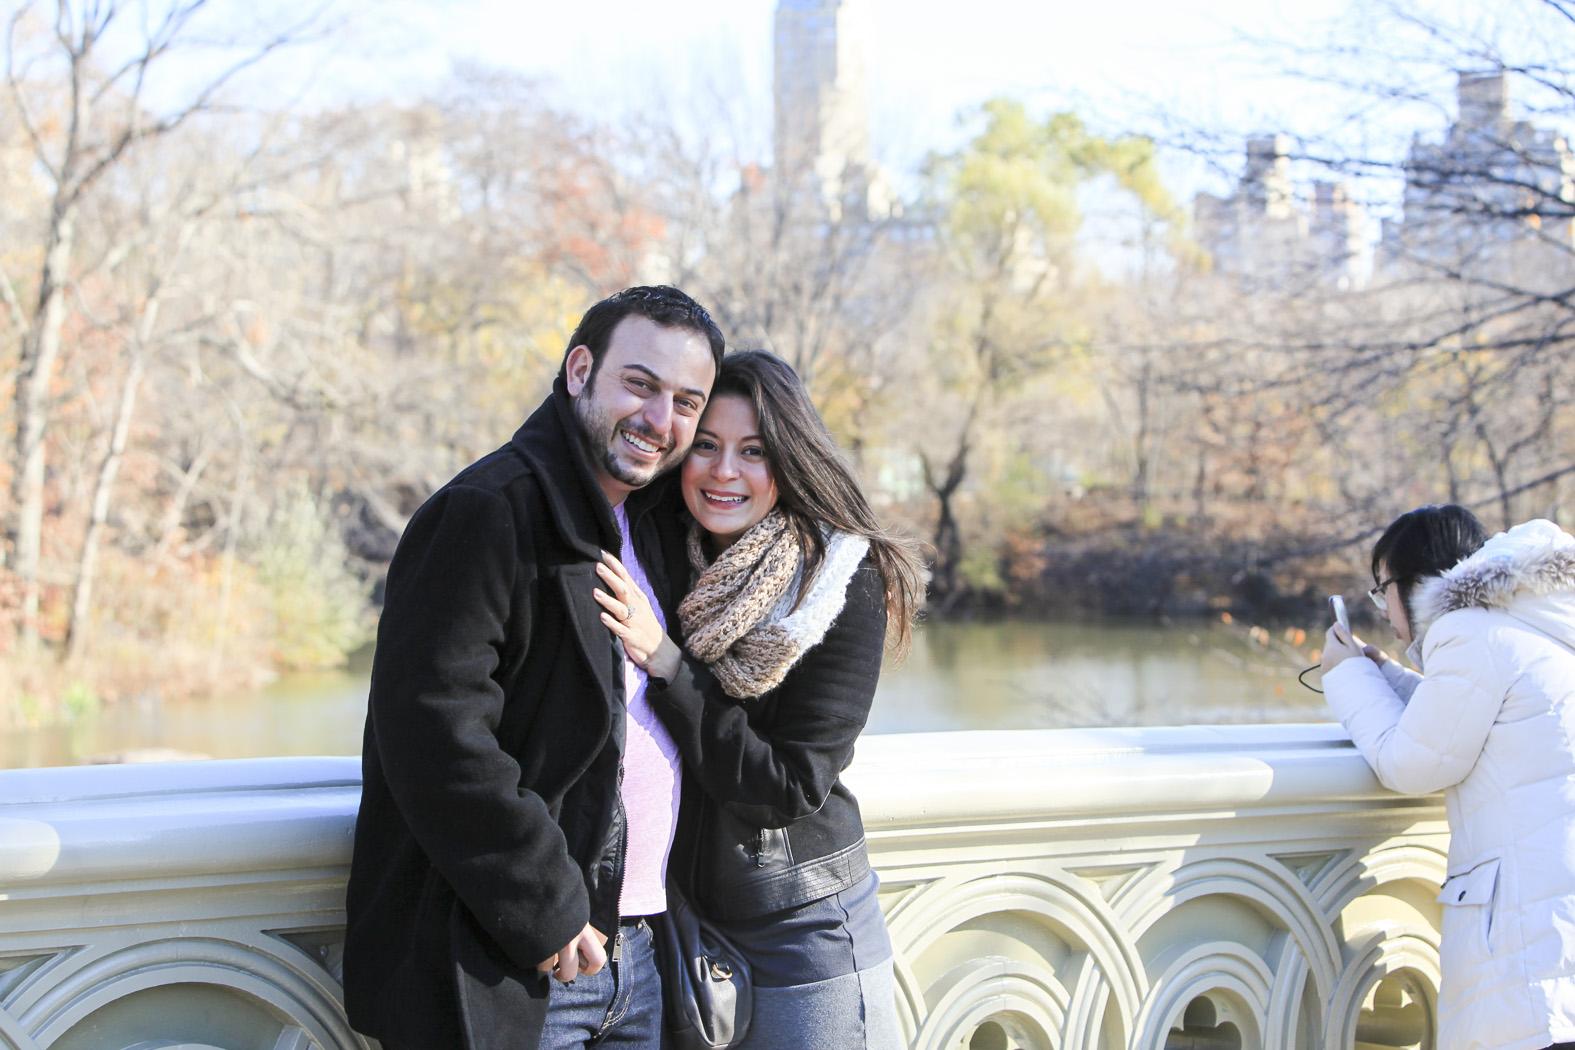 NYC Marriage Proposal Jordan - 10